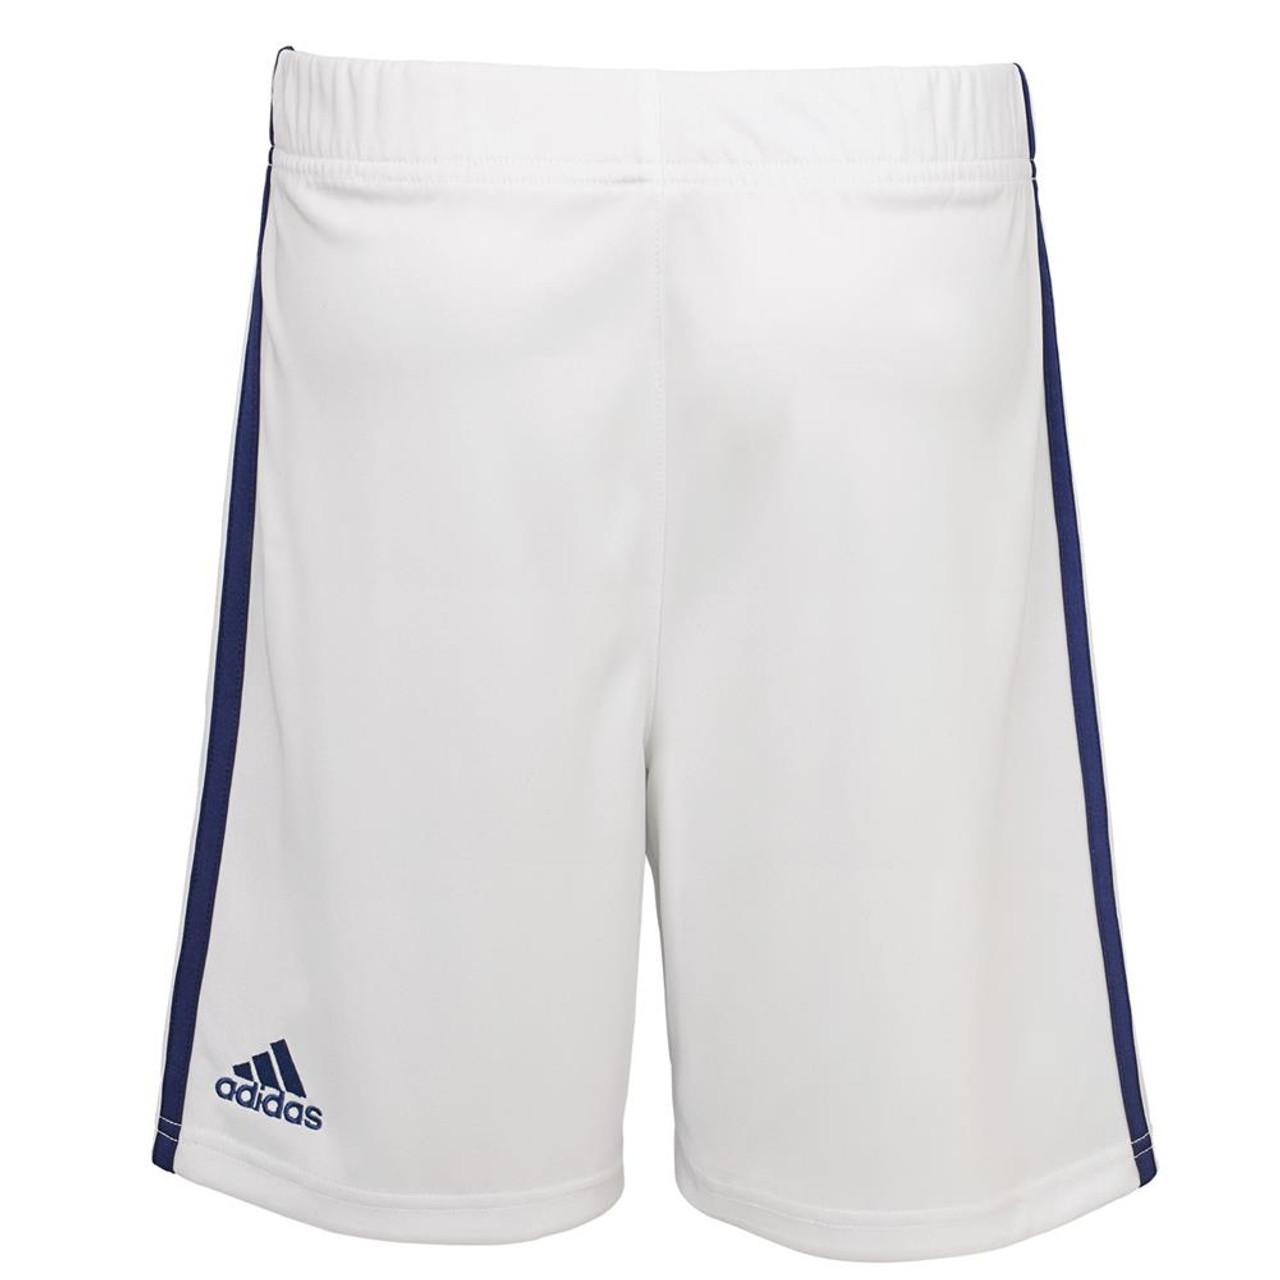 Boy's New York City FC Gym Shorts Adidas Basketball Shorts